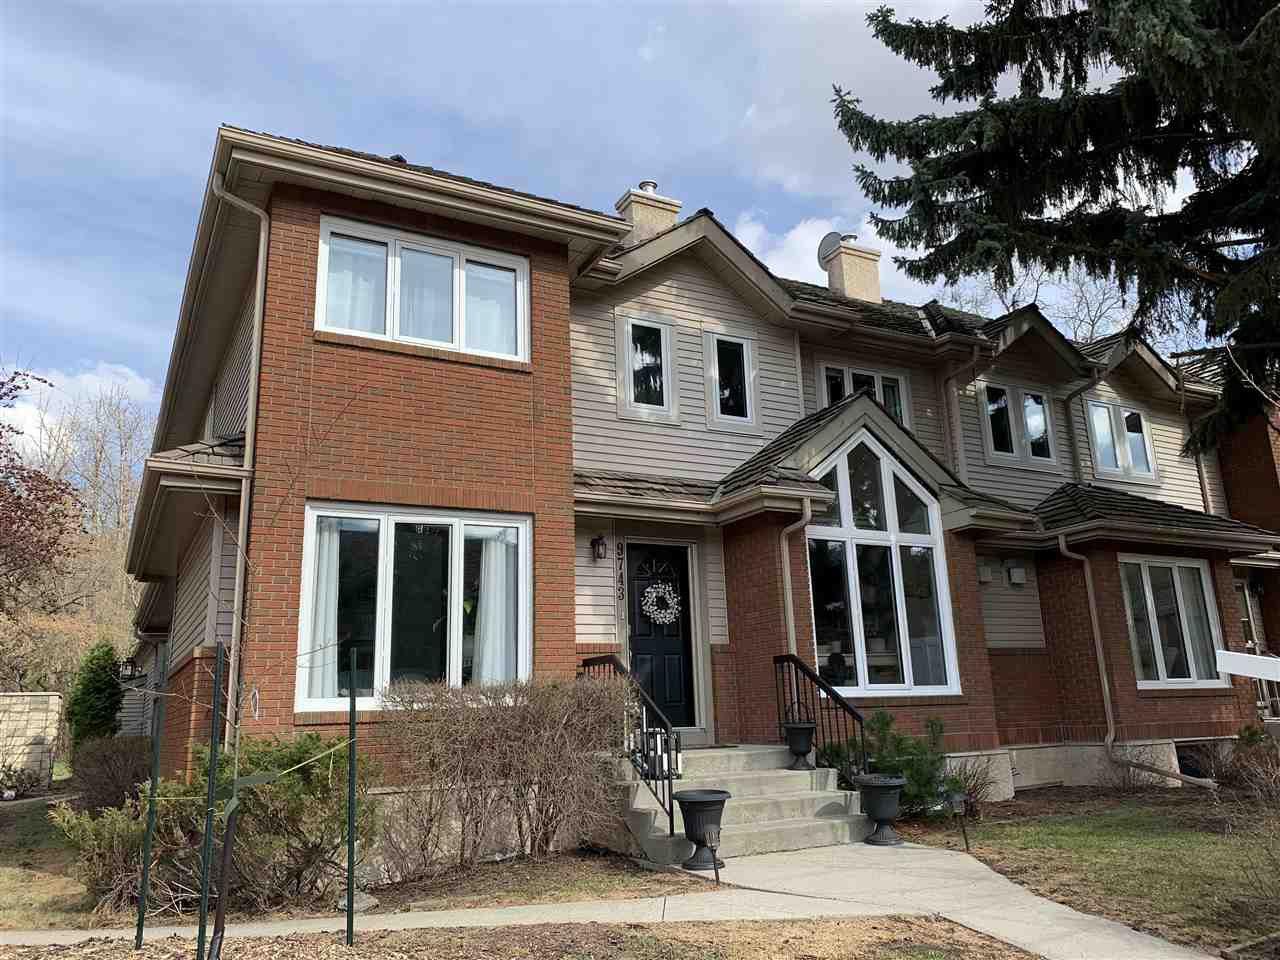 Main Photo: 9743 91 Street in Edmonton: Zone 18 Townhouse for sale : MLS®# E4195570